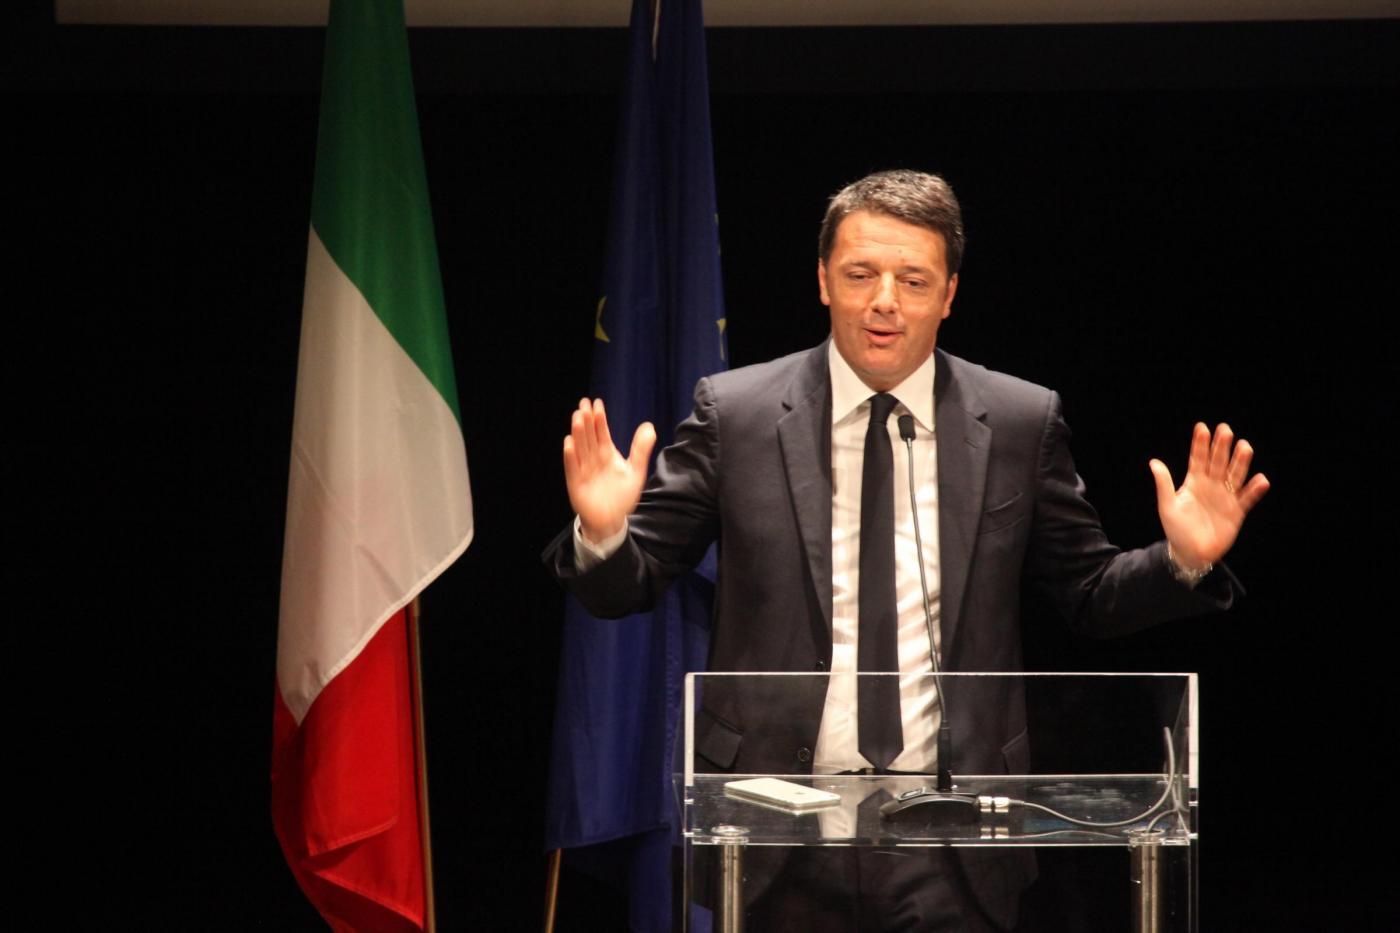 Matteo Renzi a Firenze incontra i cittadini Teatro Niccolini